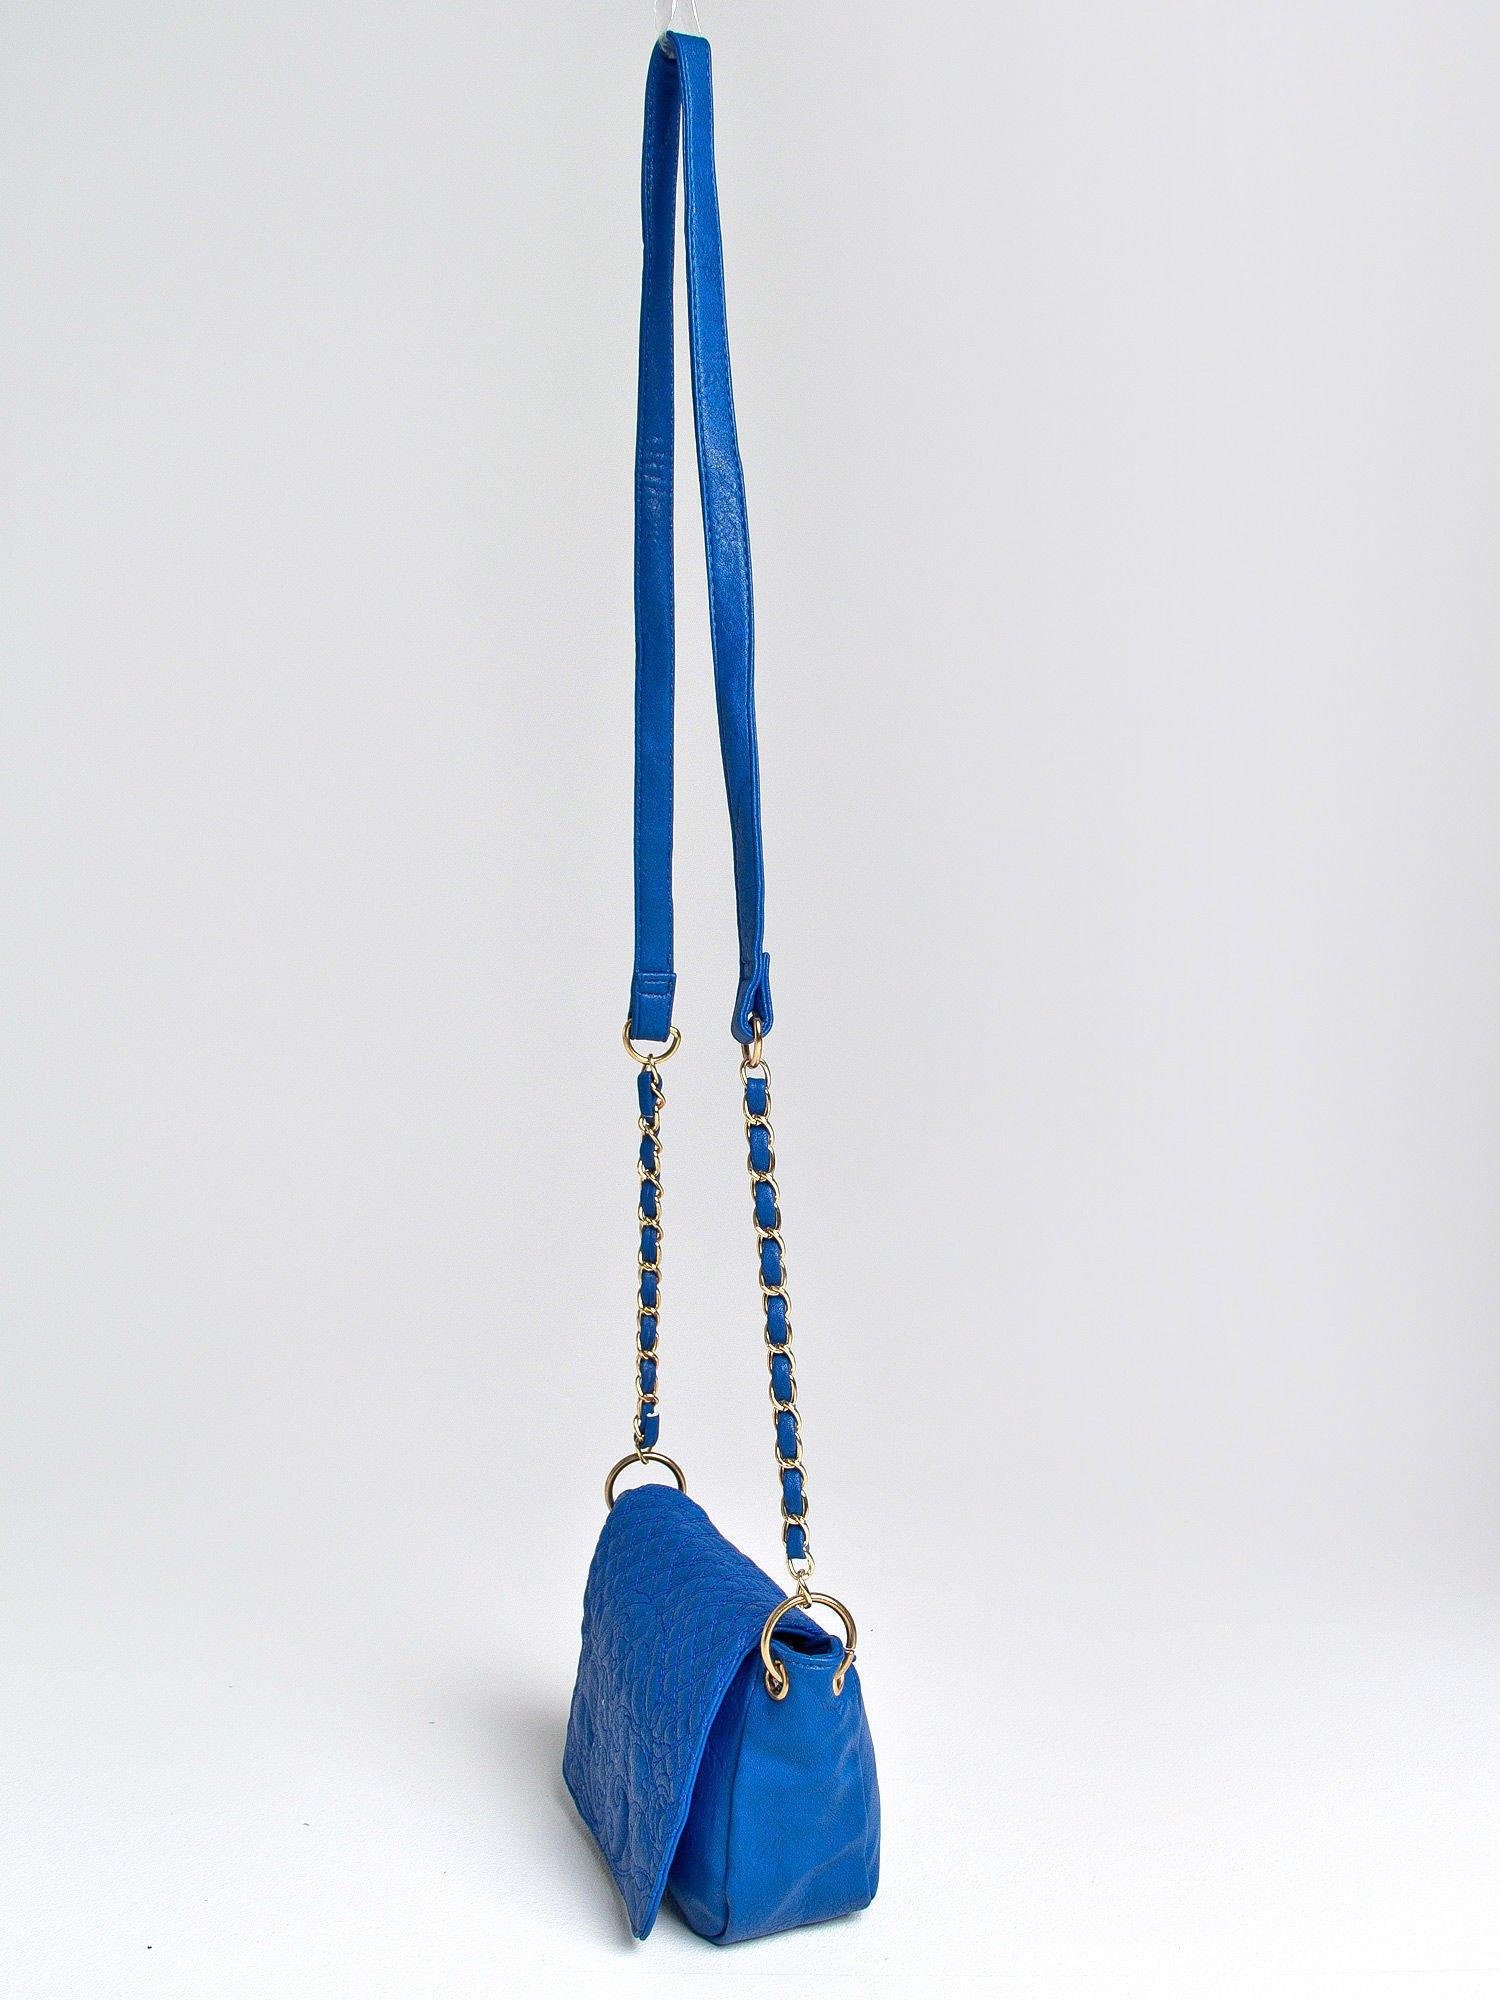 Niebieska torebka na ramię na pasku łańcuszku                                  zdj.                                  3